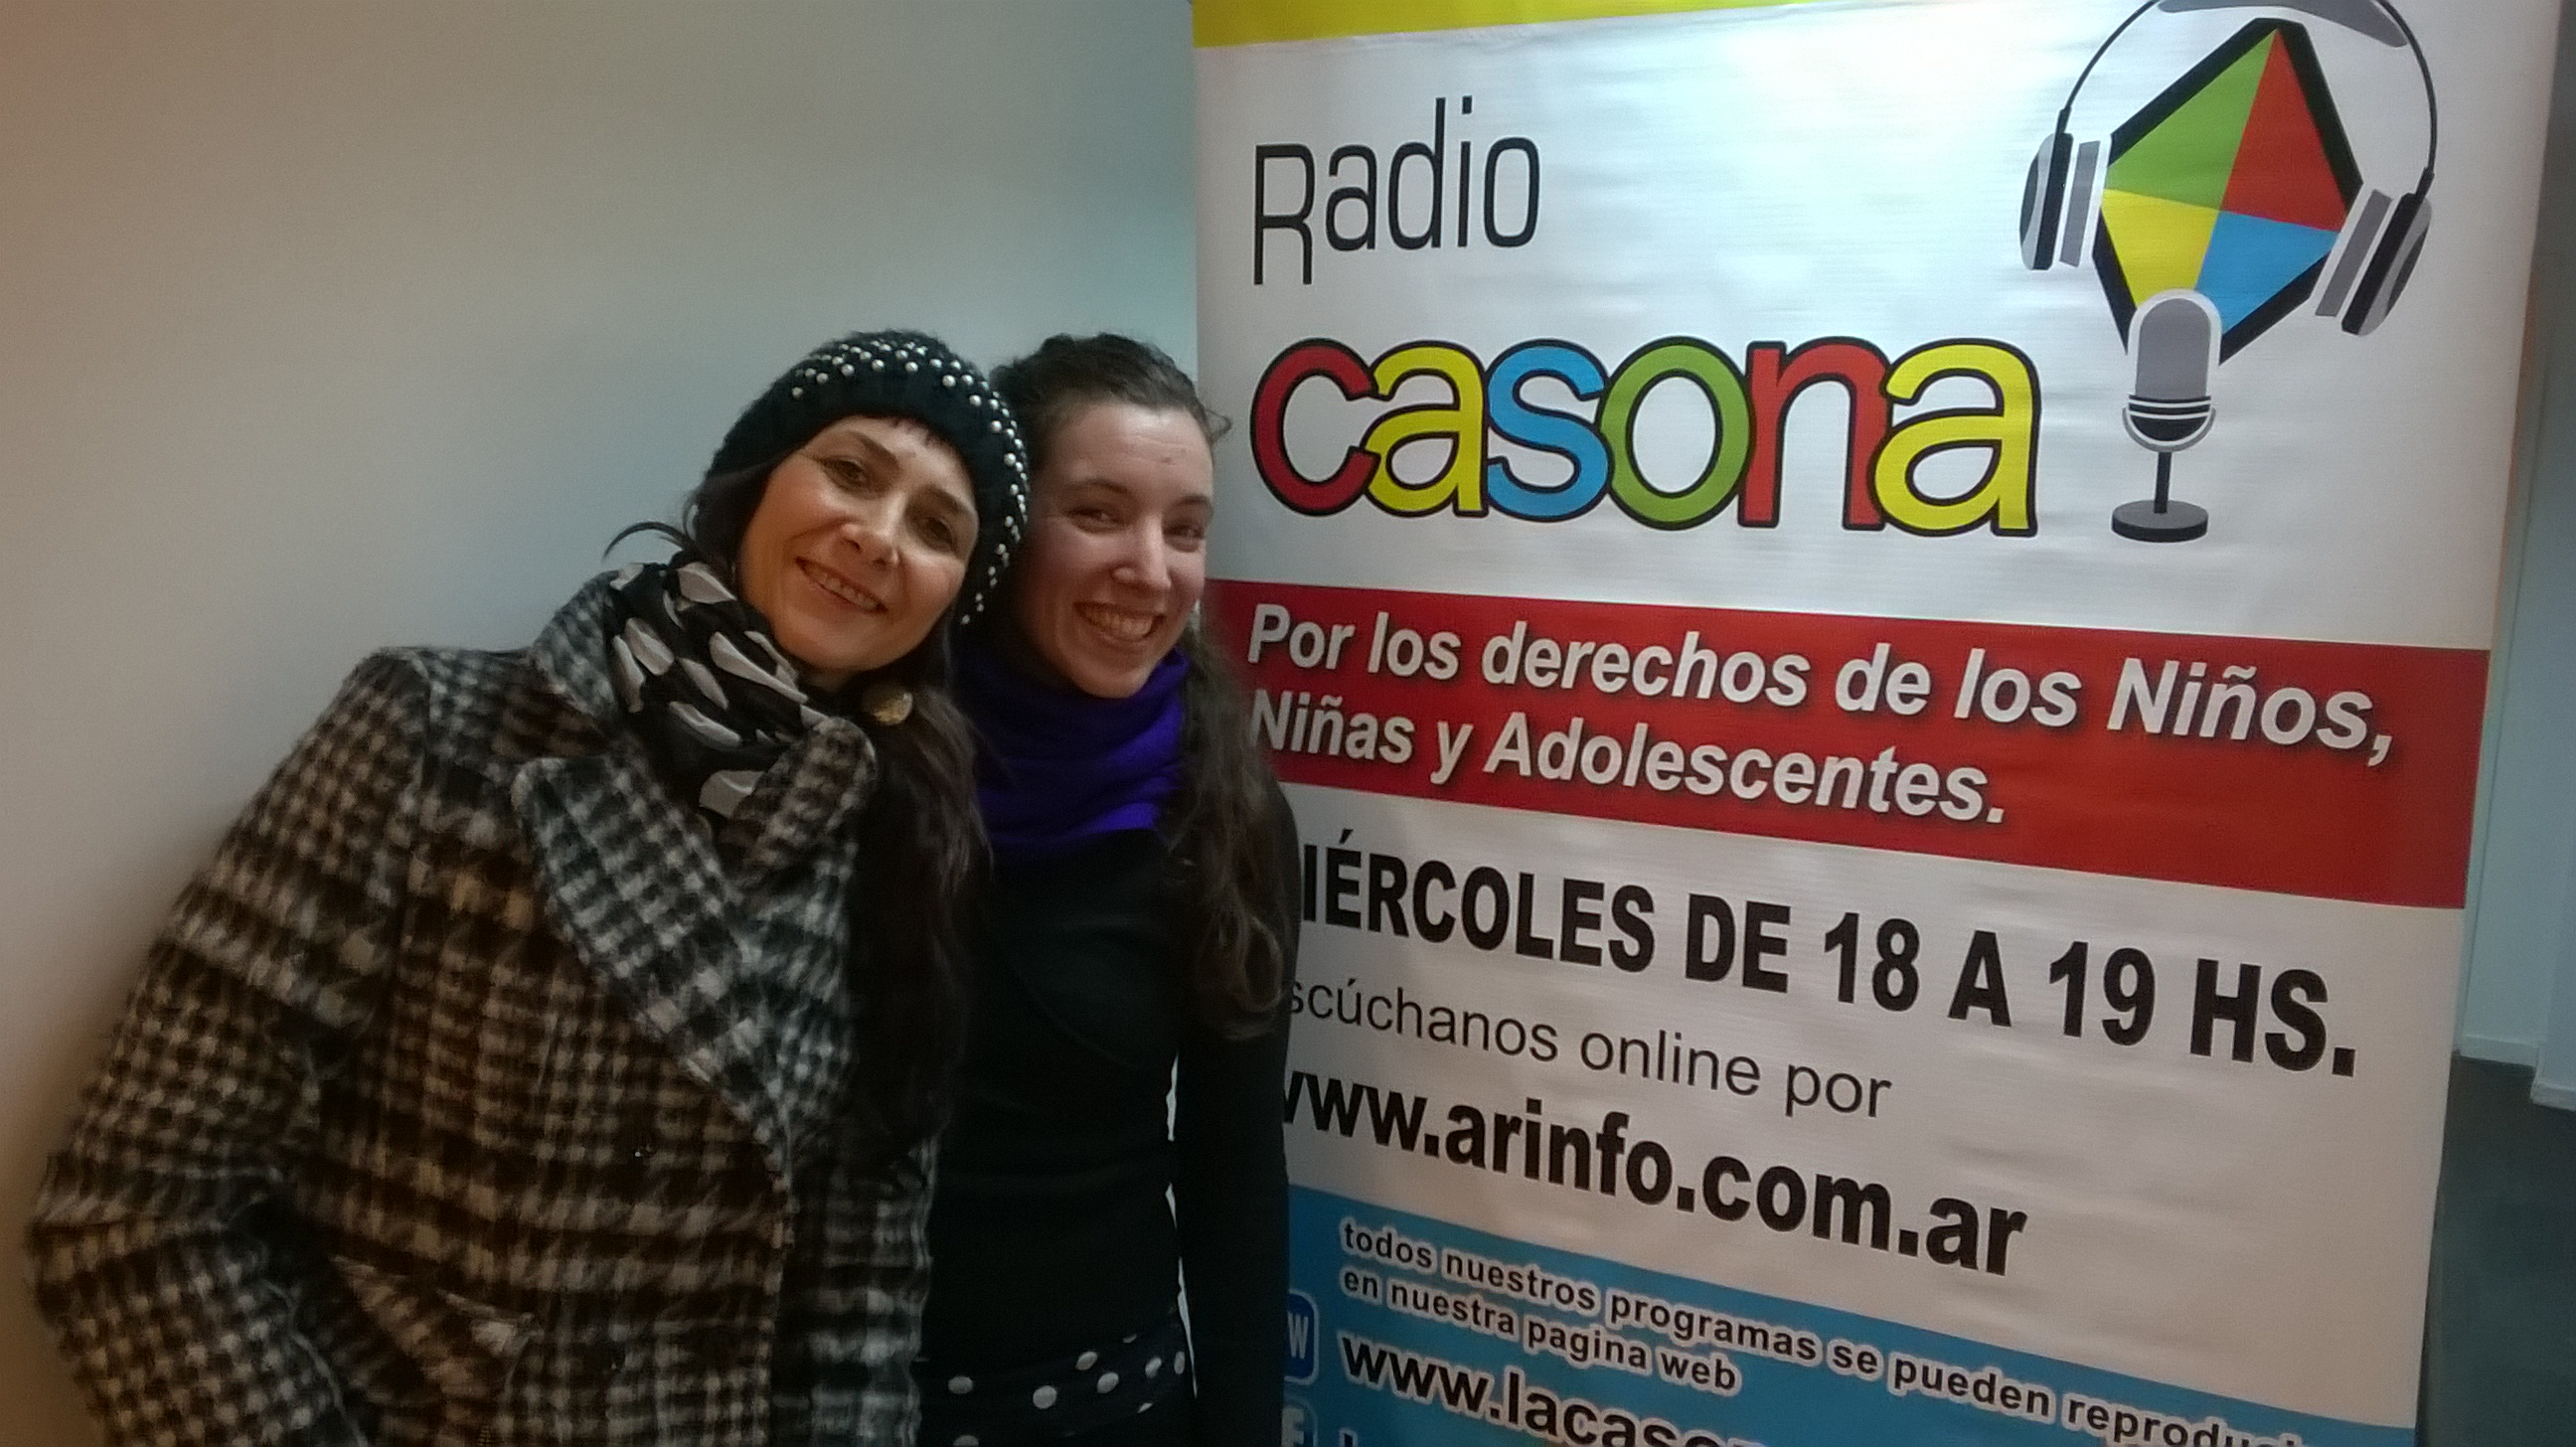 Ana De Marchi y Valeria Rosenberg